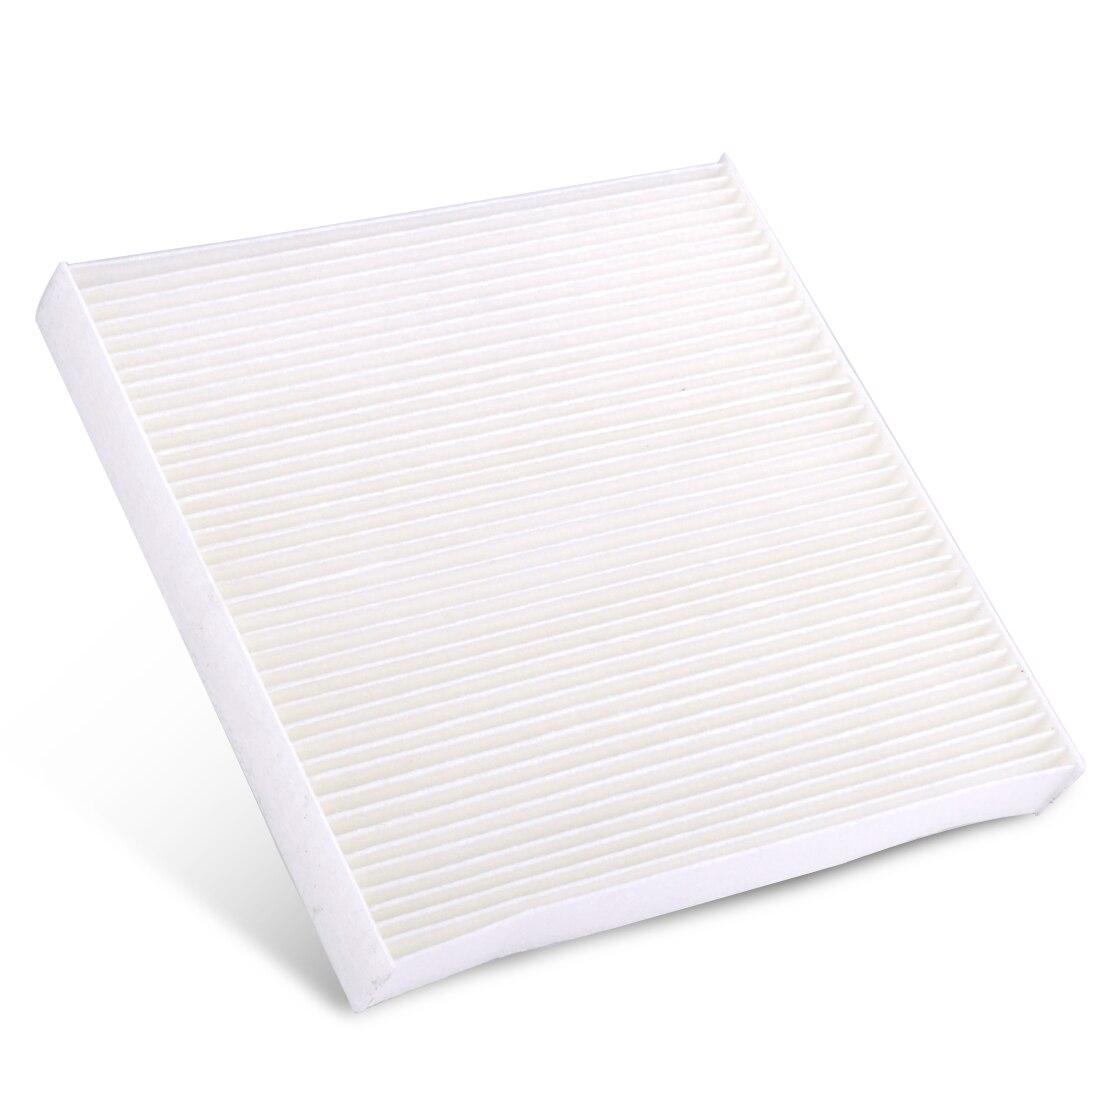 Beler Sda A01 Filter Cloth White Cabin Air Filter